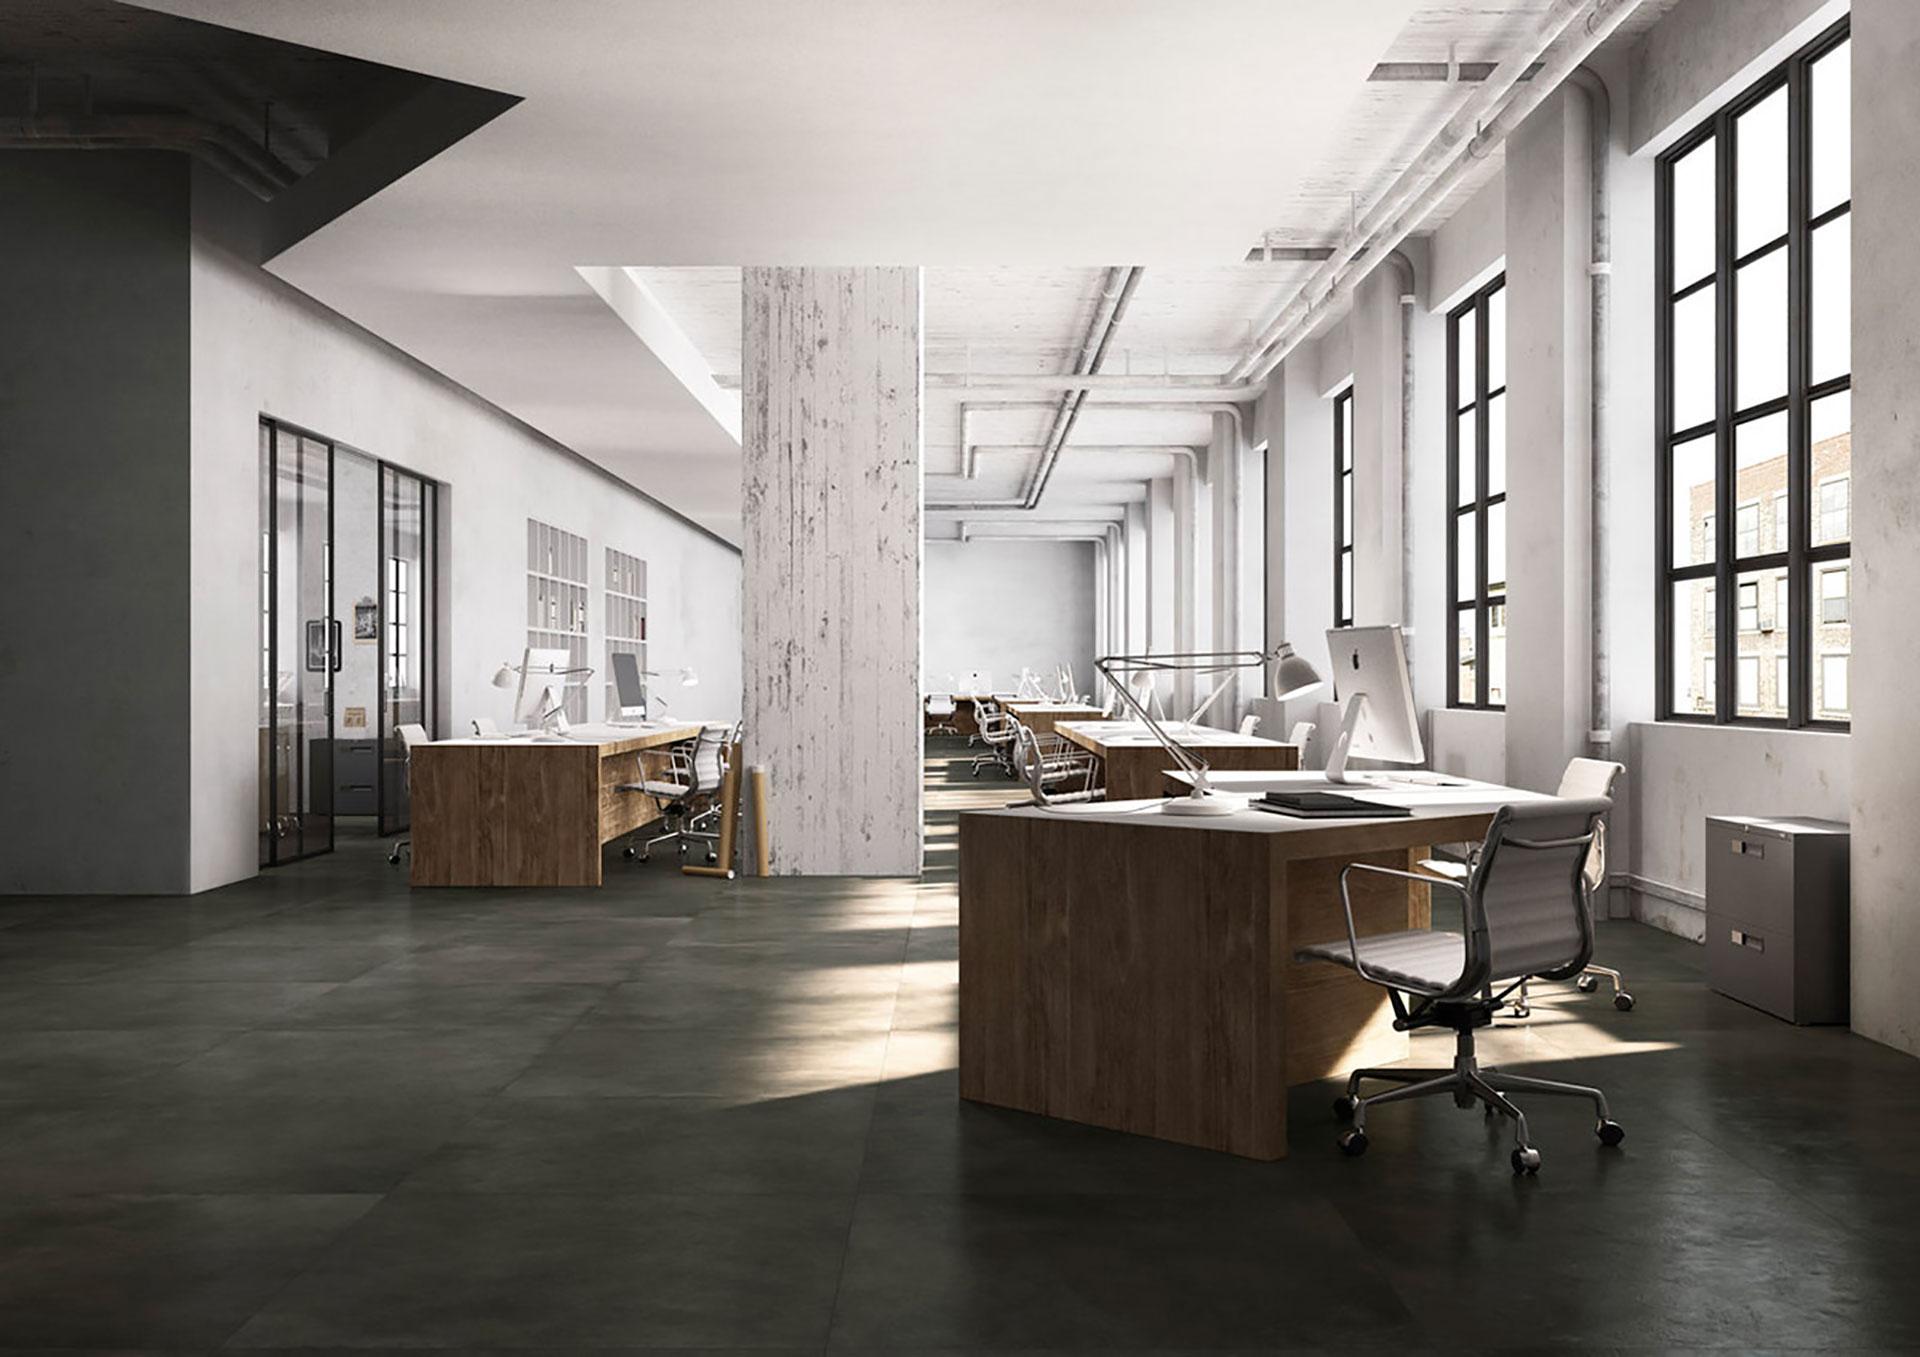 Fußboden Gießen Quantum ~ Fußboden harz lange lebensdauer maydos epoxy bodenbelag harz